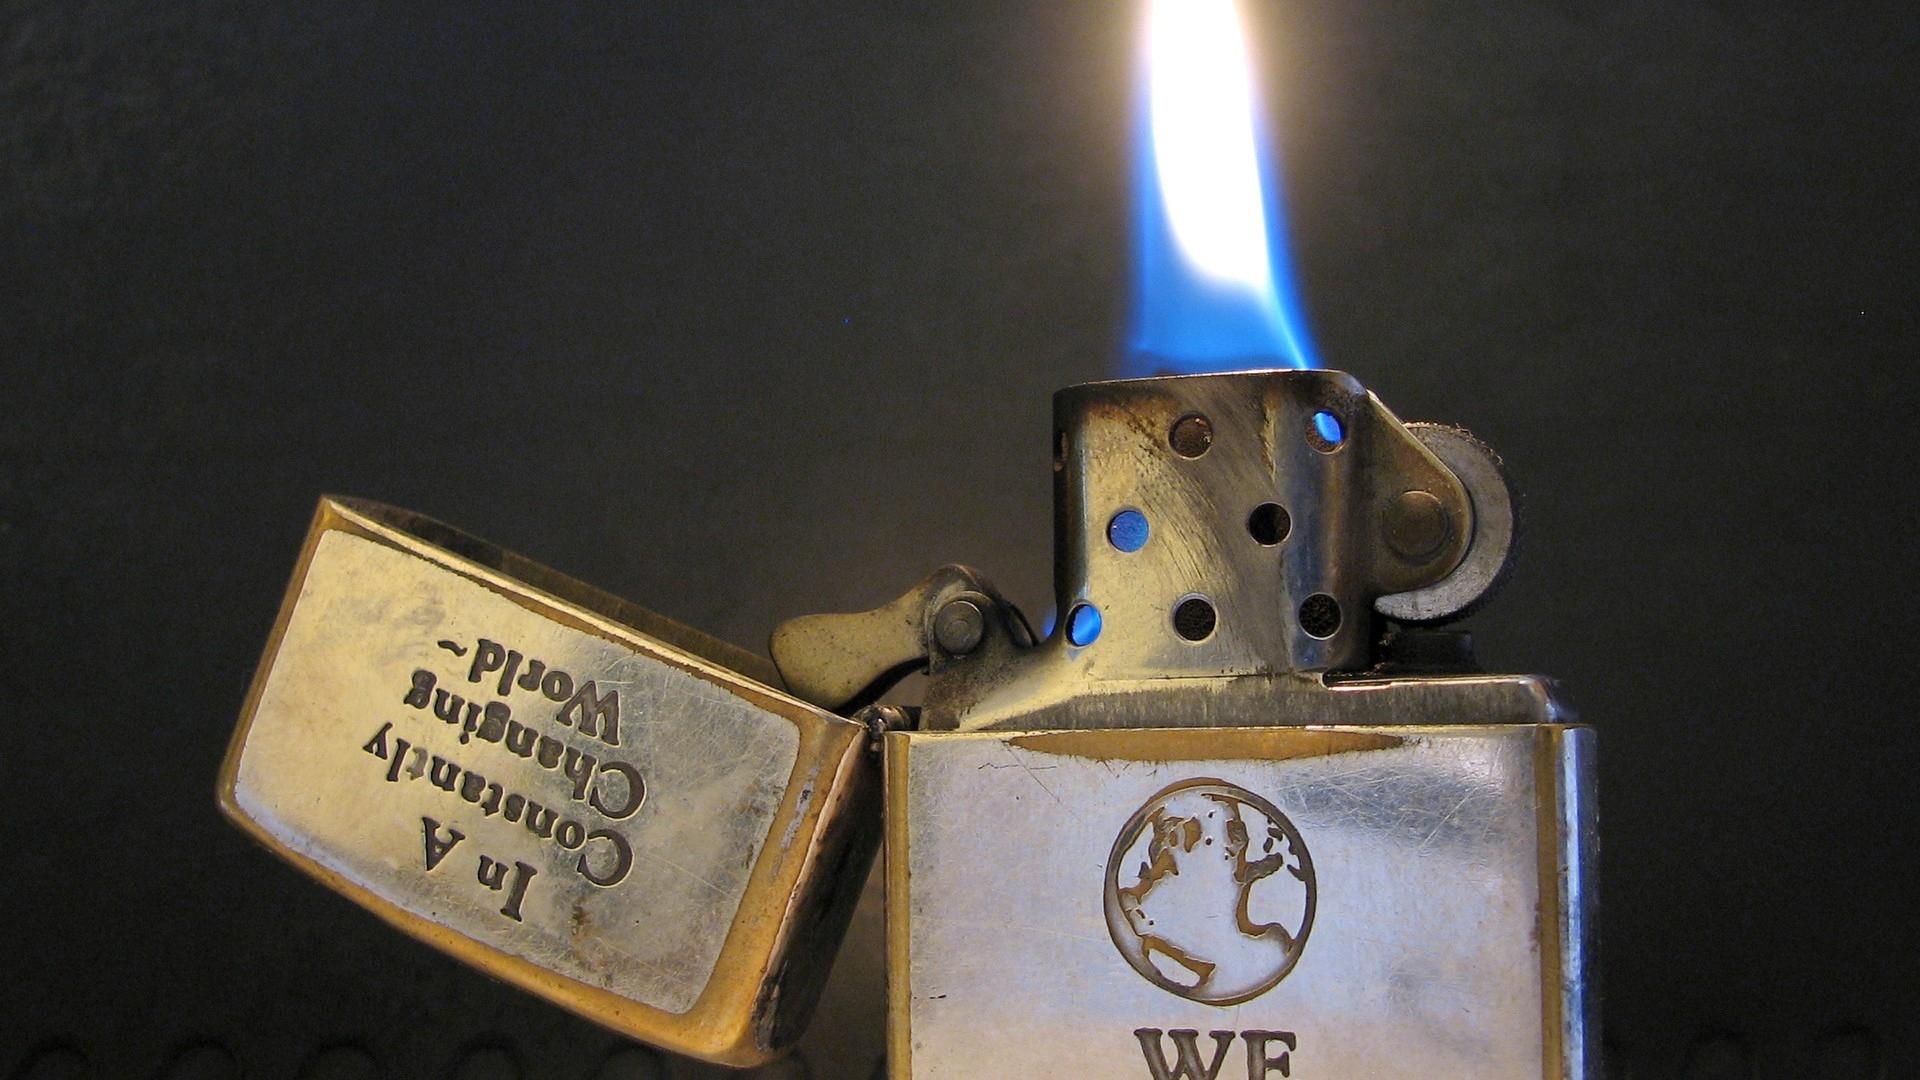 Download Wallpaper 1920x1080 Lighter Metal Fire Flame Full HD